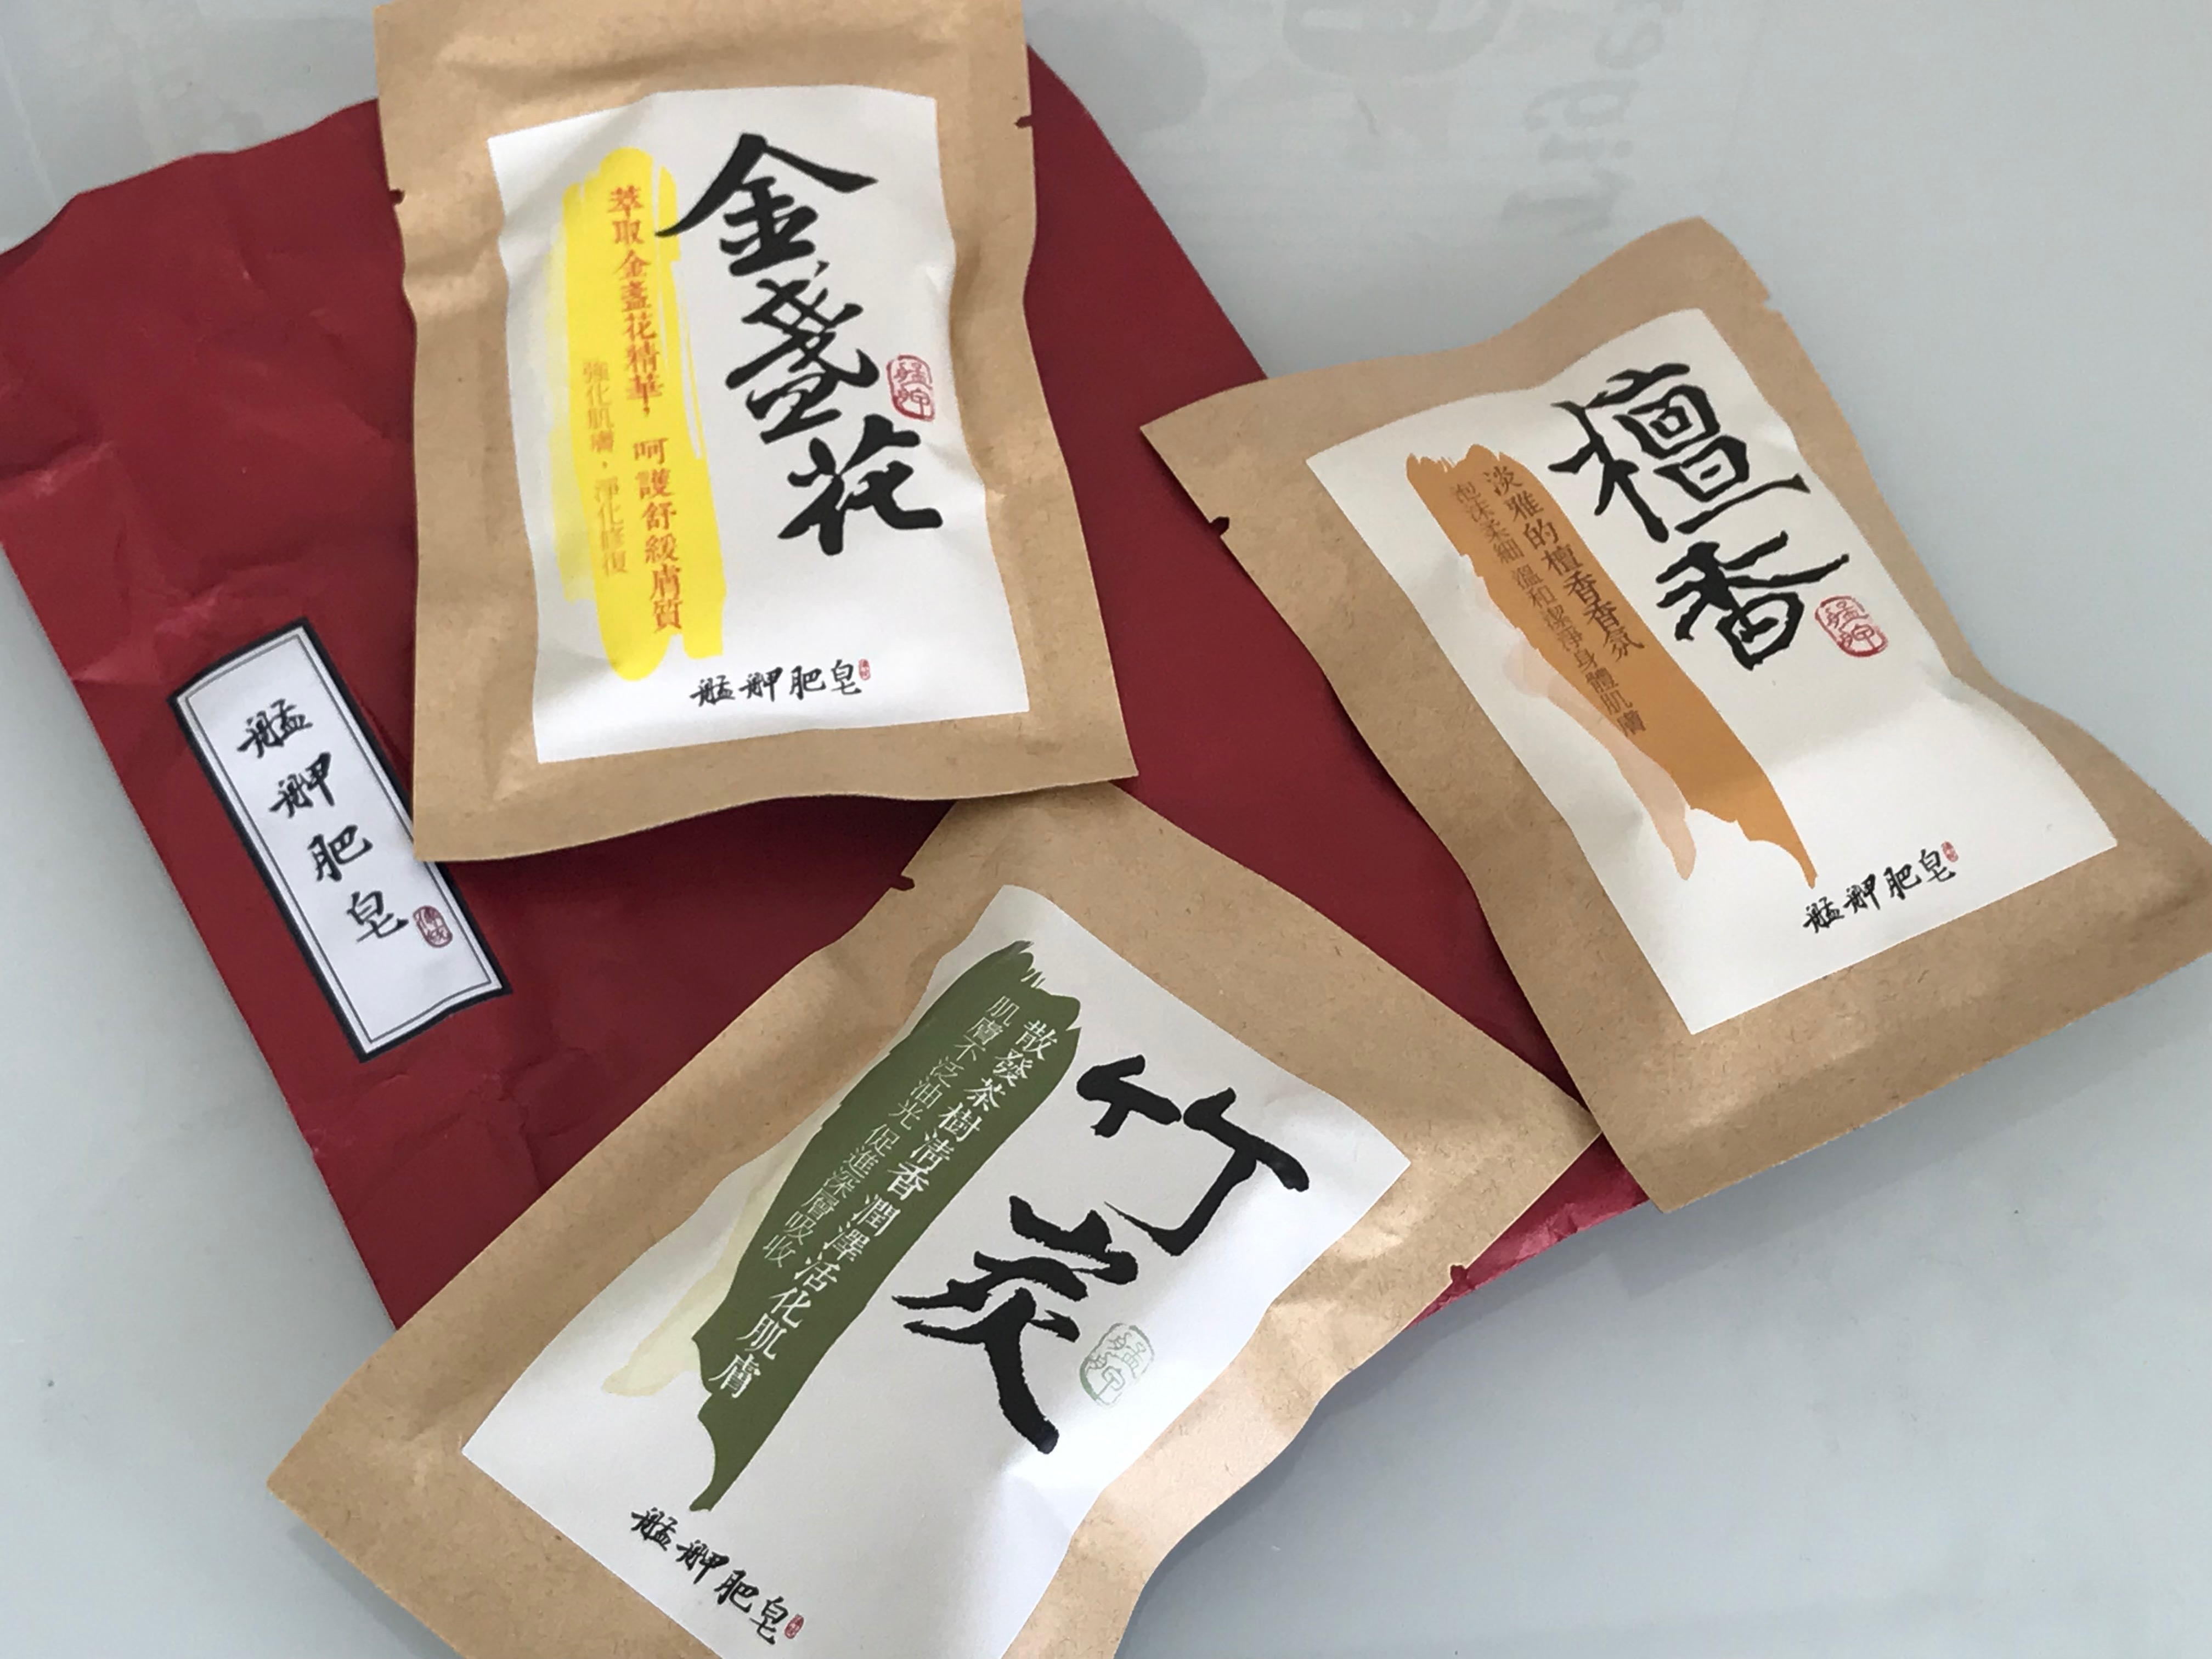 台北松山空港のお土産 石鹸